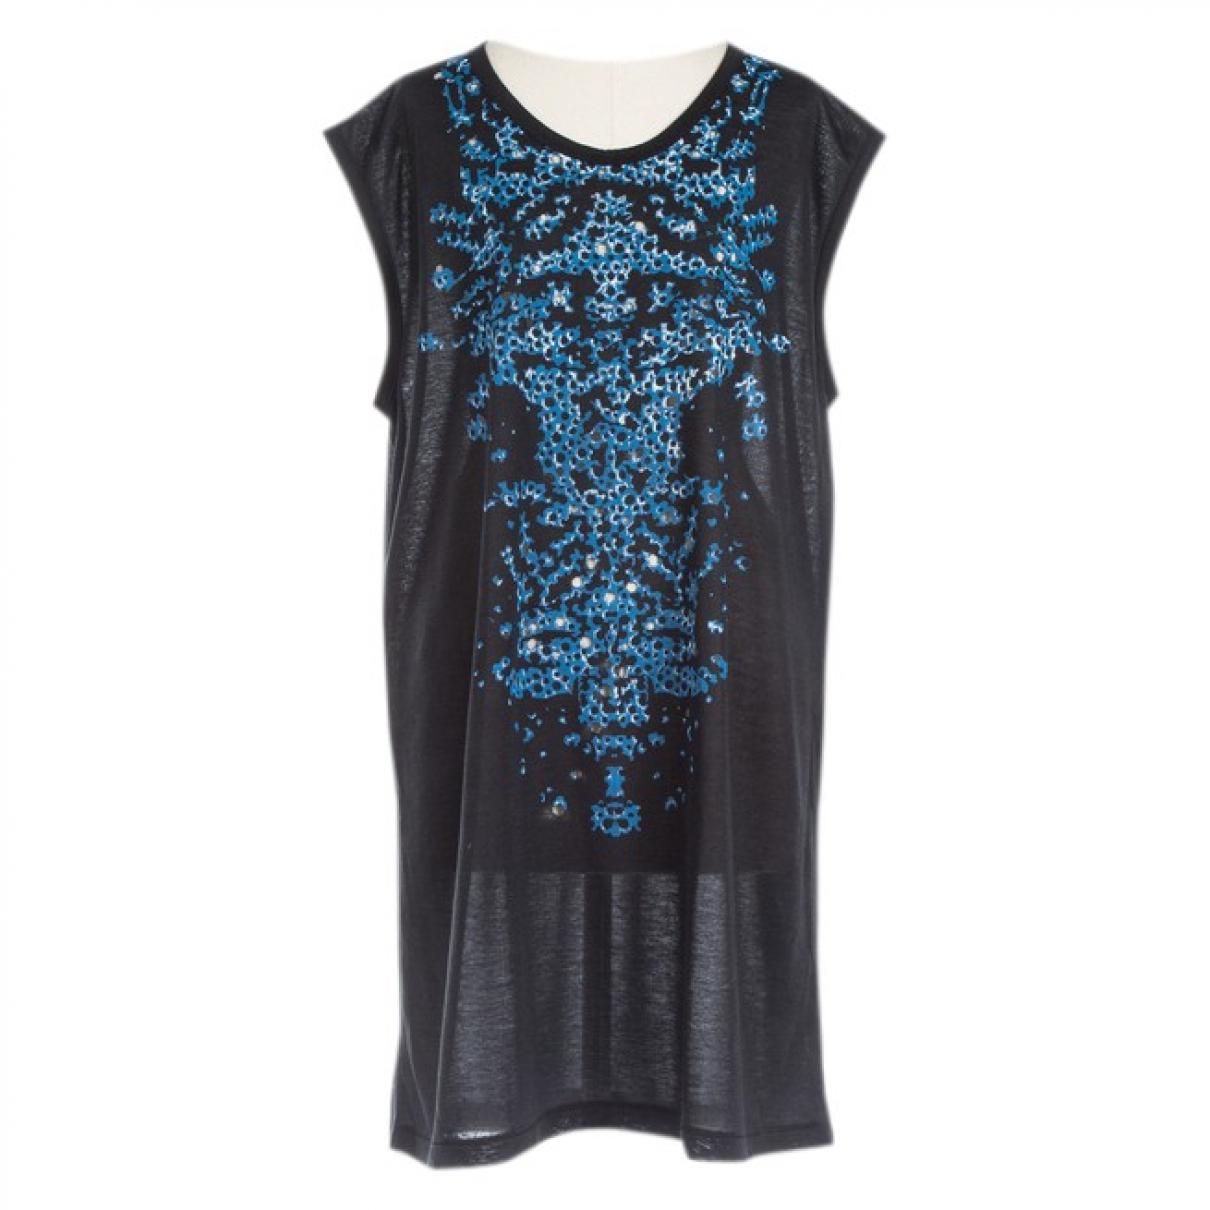 Balenciaga \N Black Cotton dress for Women 36 FR